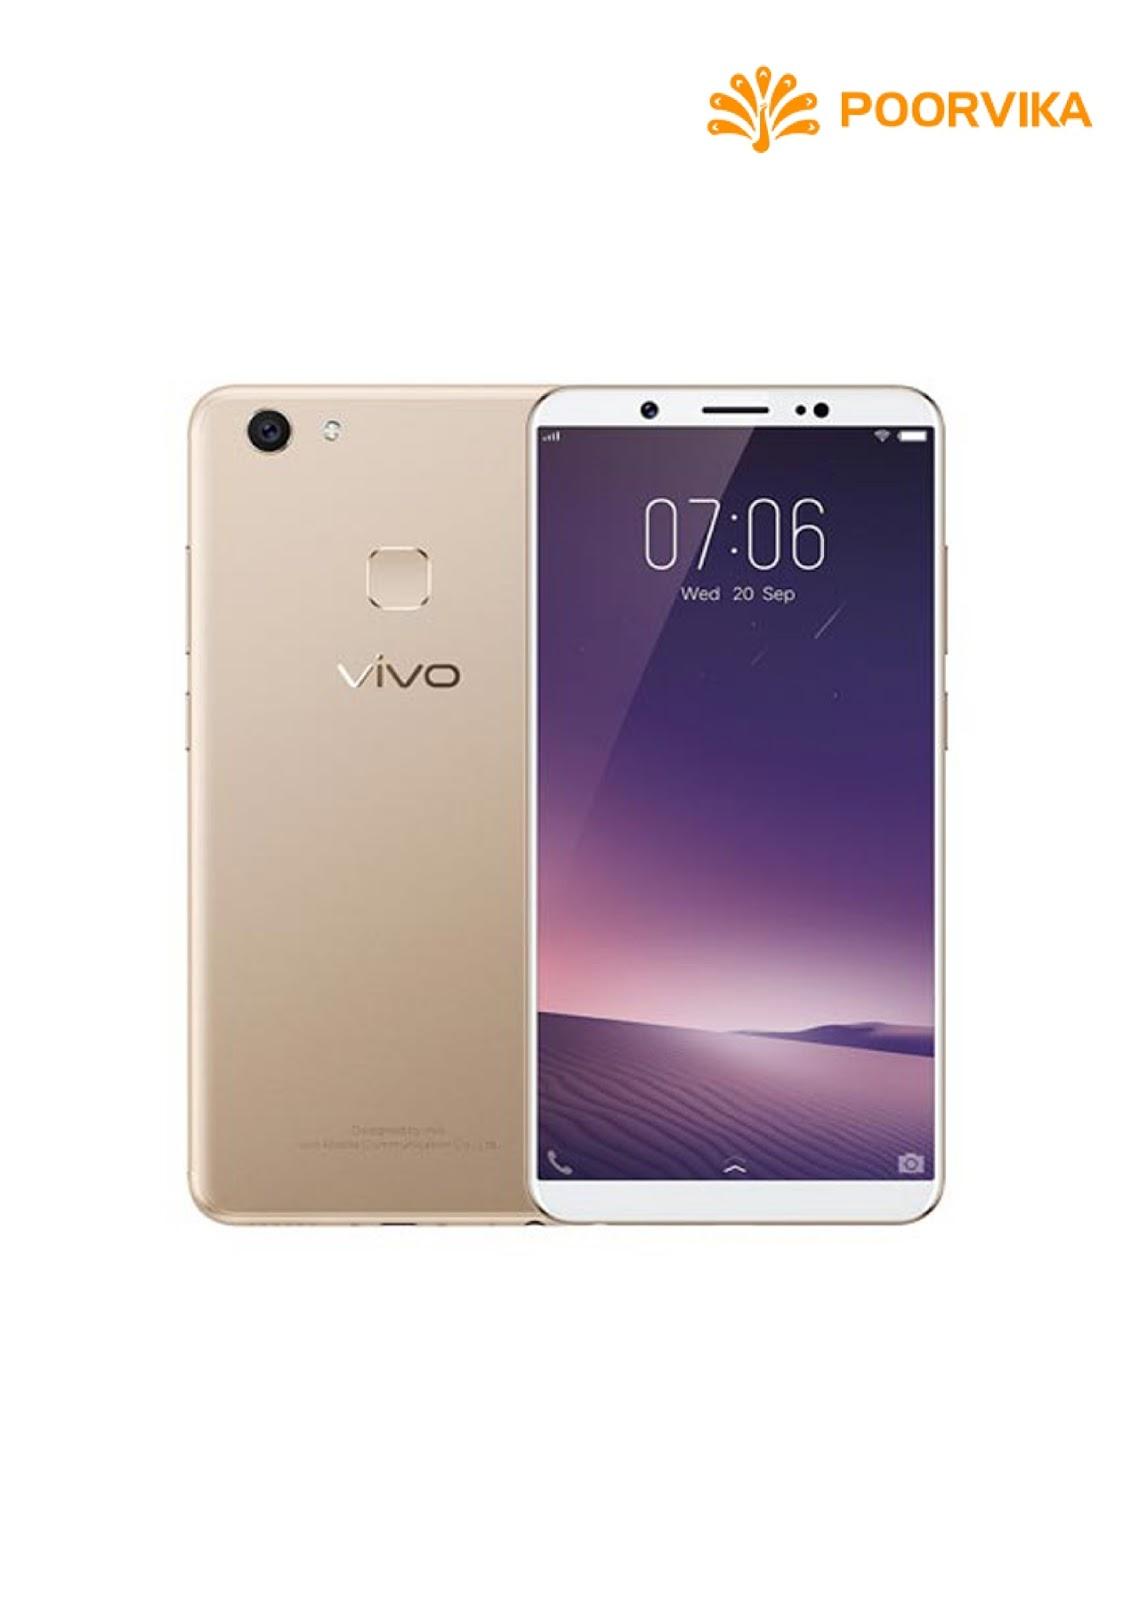 2018 Onlinemobileshopping Vivo Y21 16gb Grey Free Gift Image